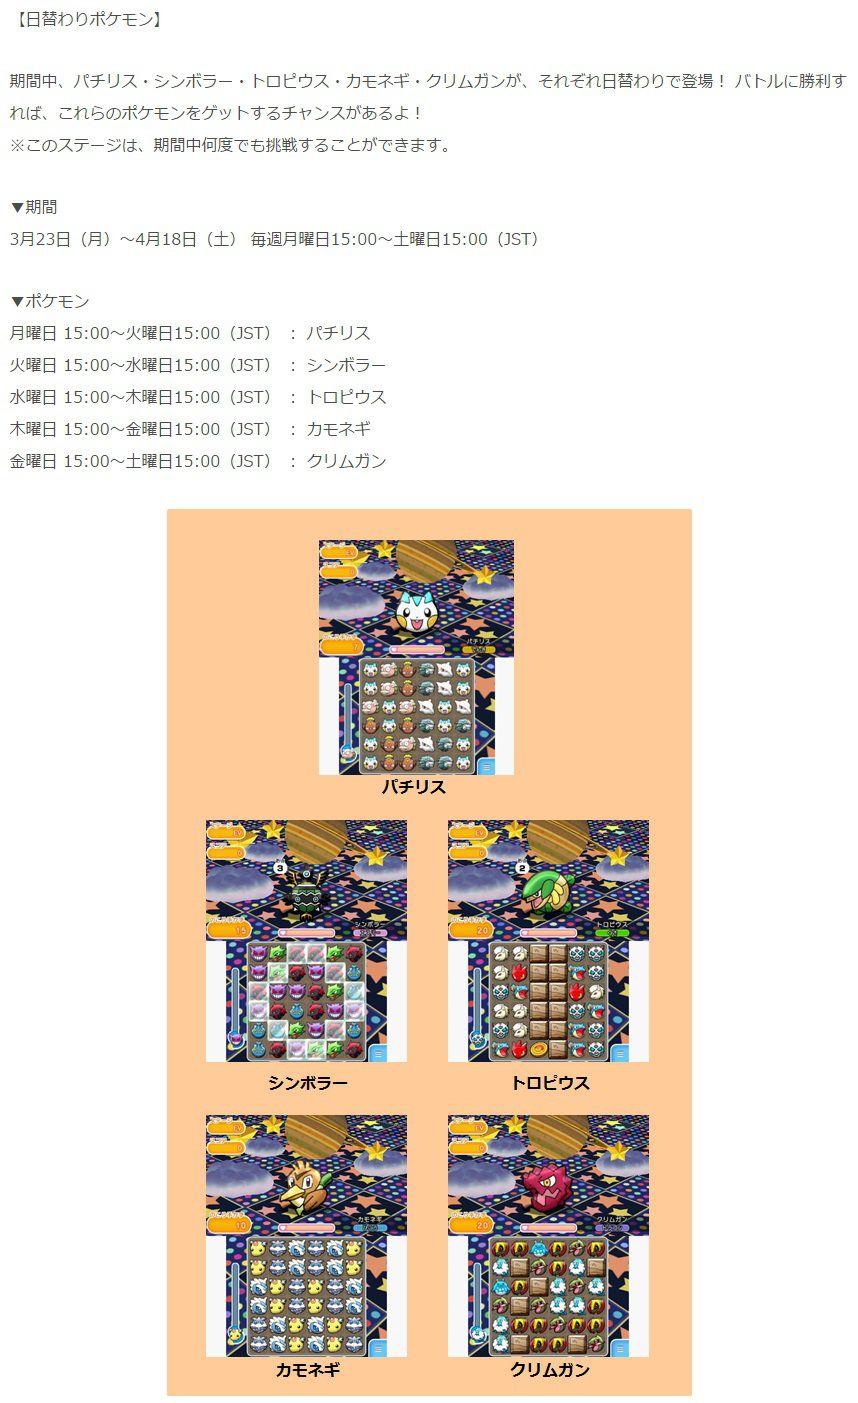 image_5613.jpg